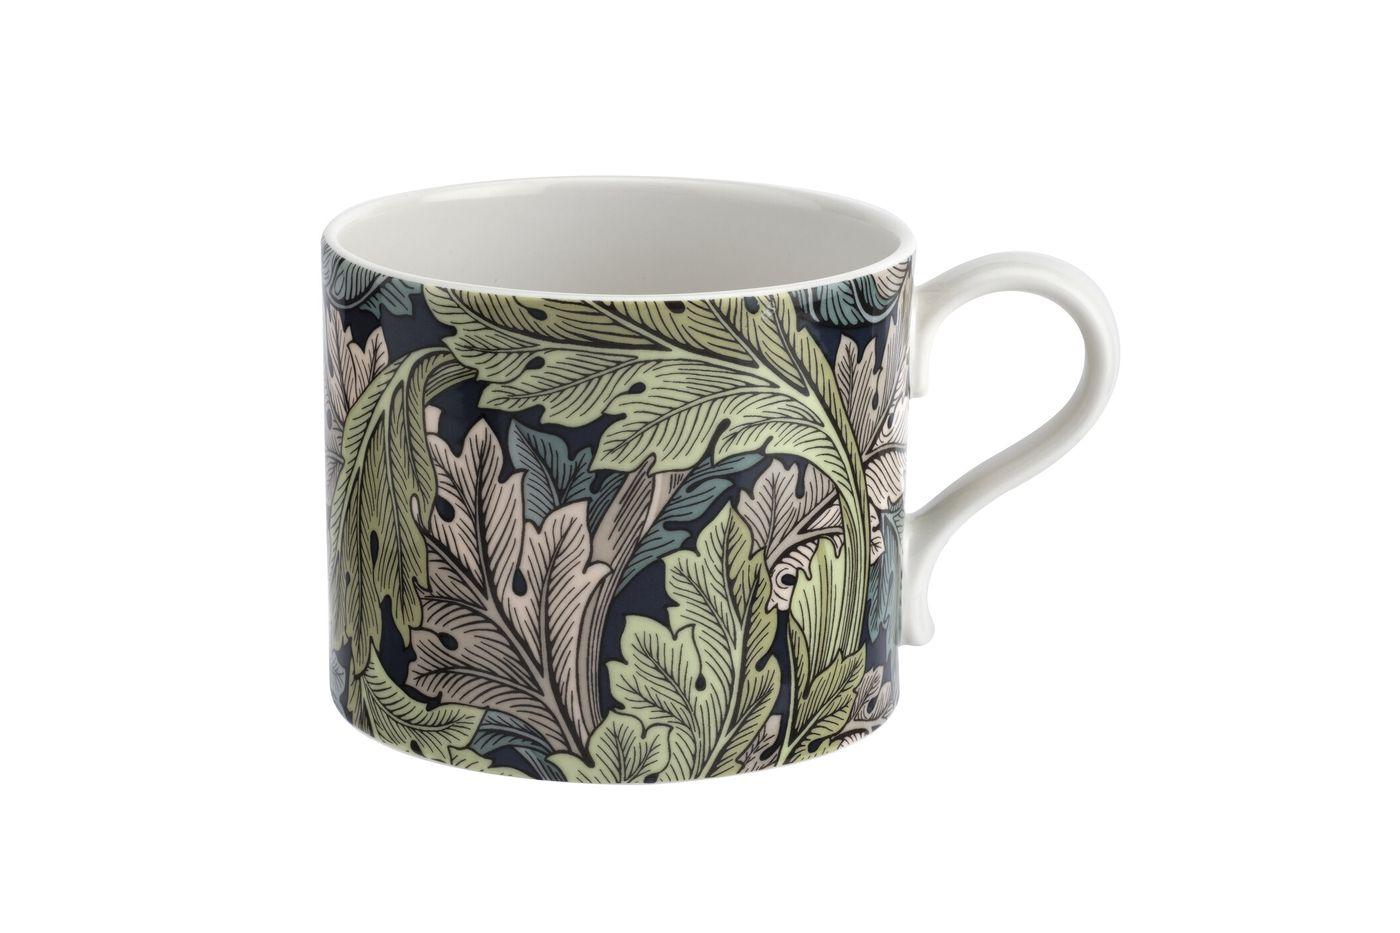 Spode The Original Morris & Co. Mug - Set of 2 Brook & Acanthus 0.34l thumb 4